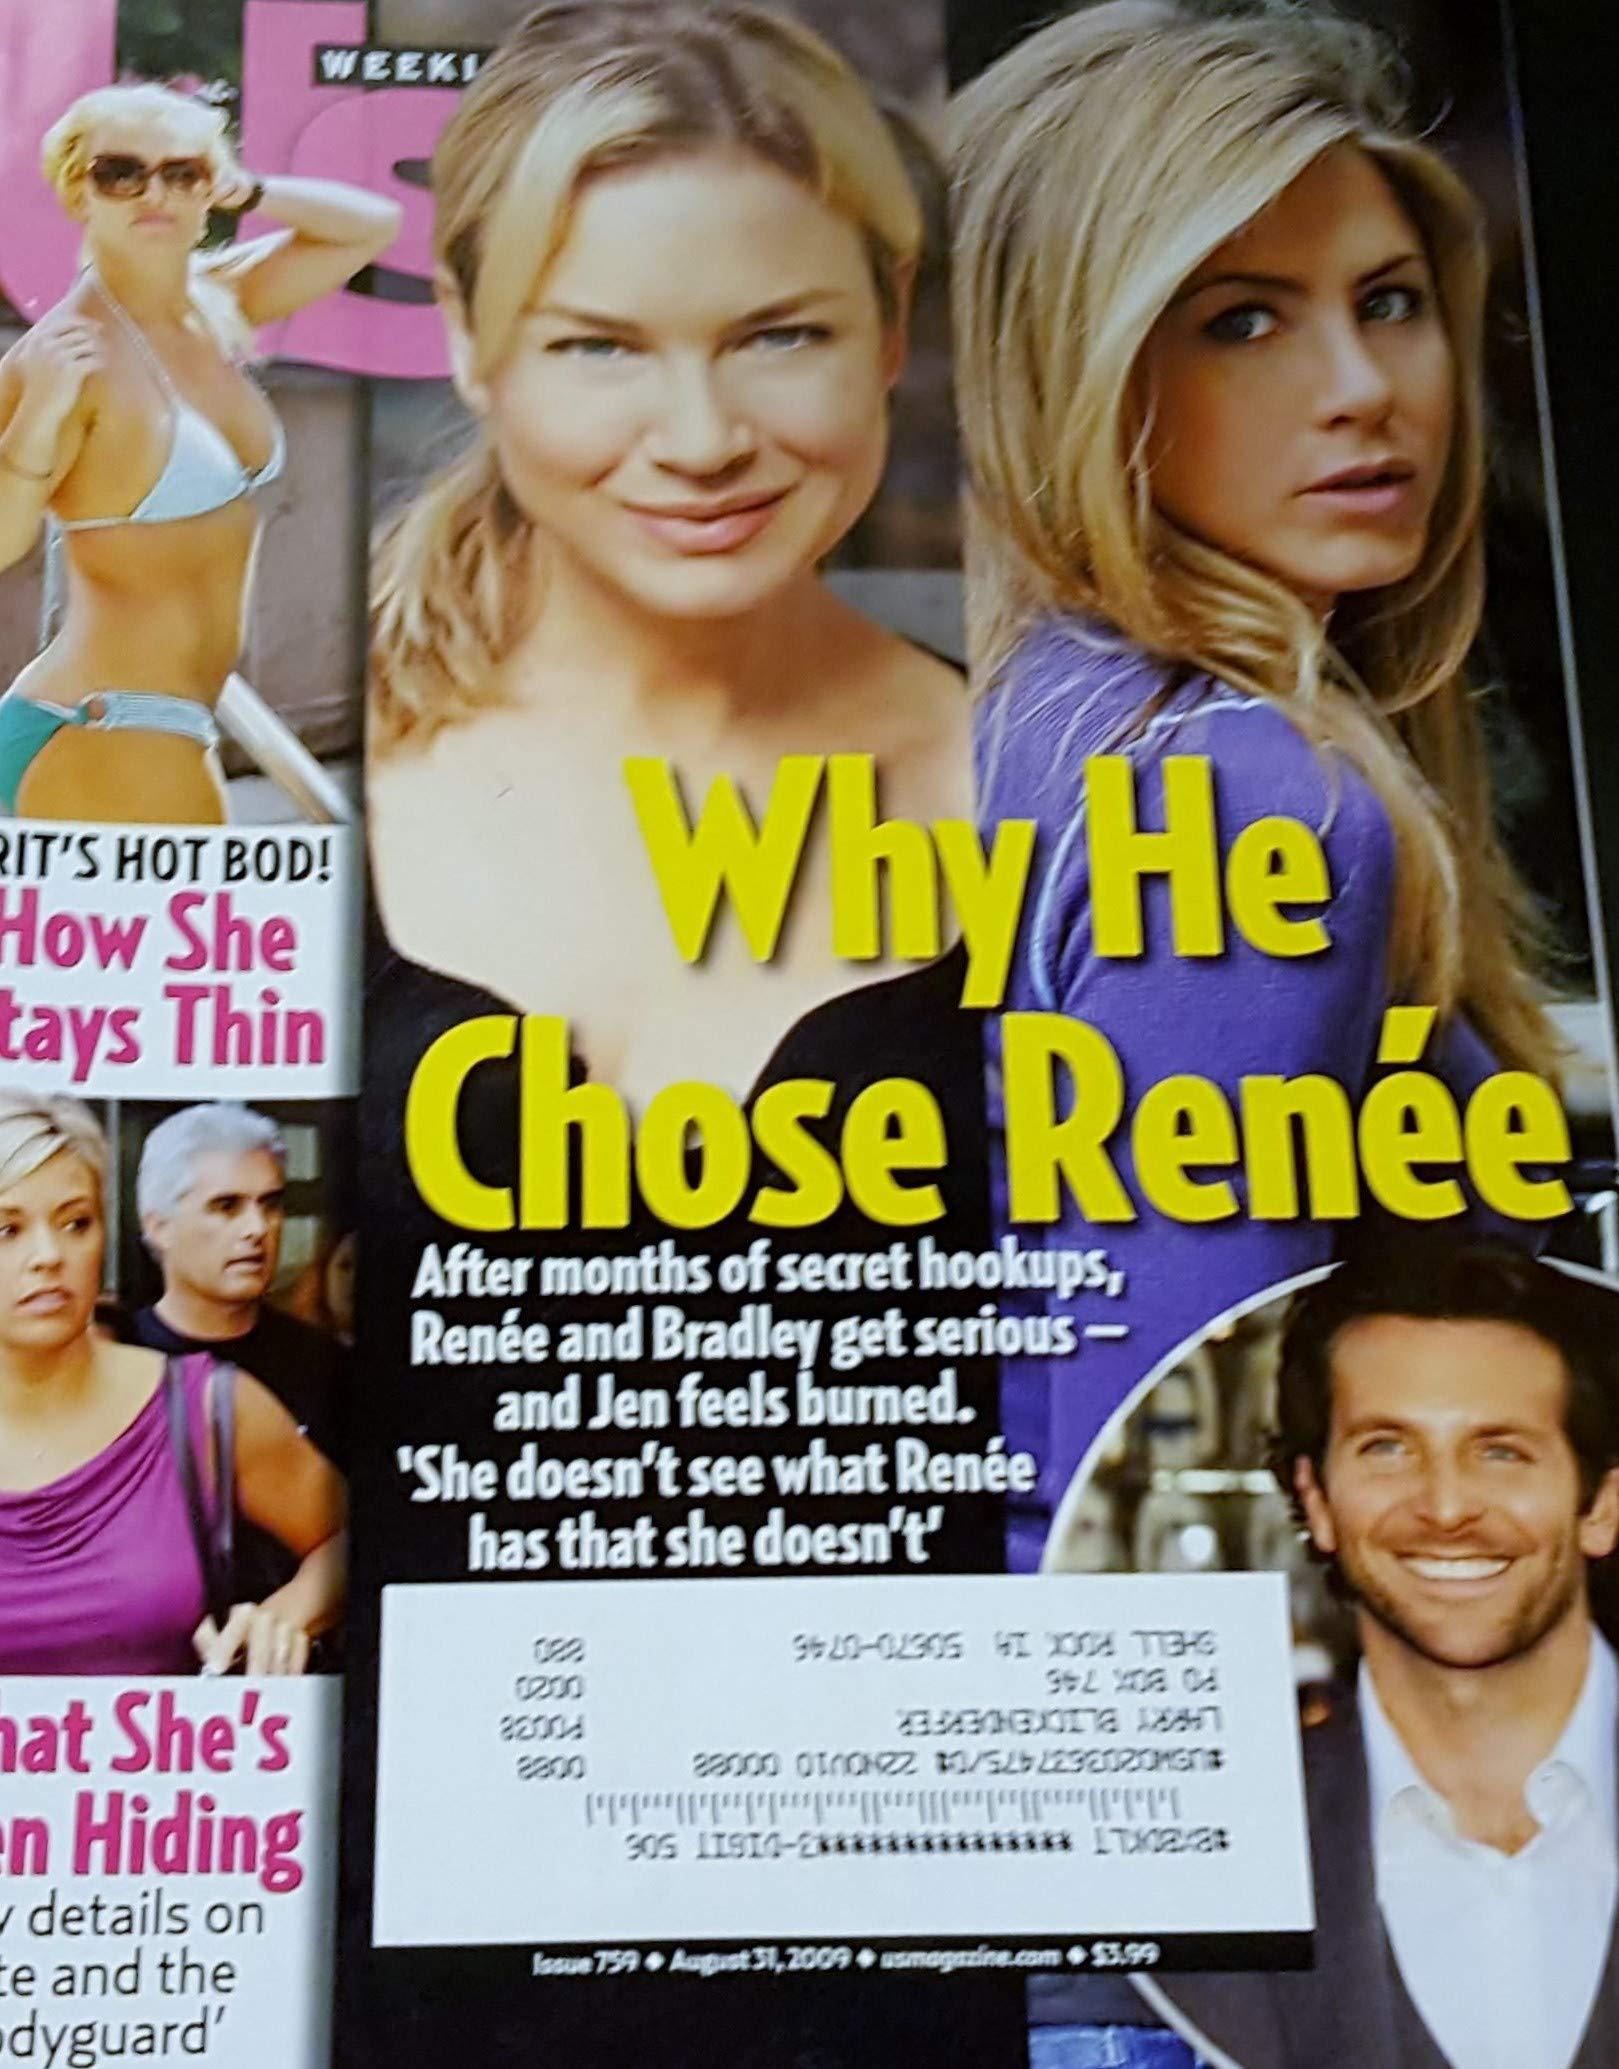 Download Us Weekly Magazine August 31 2009 Renee Zellwegger & Jennifer Aniston on Cover, Bradley Cooper, Britney Spears' Hot Bod - How She Stays Thin, Kate Gosselin & the Bodyguard pdf epub